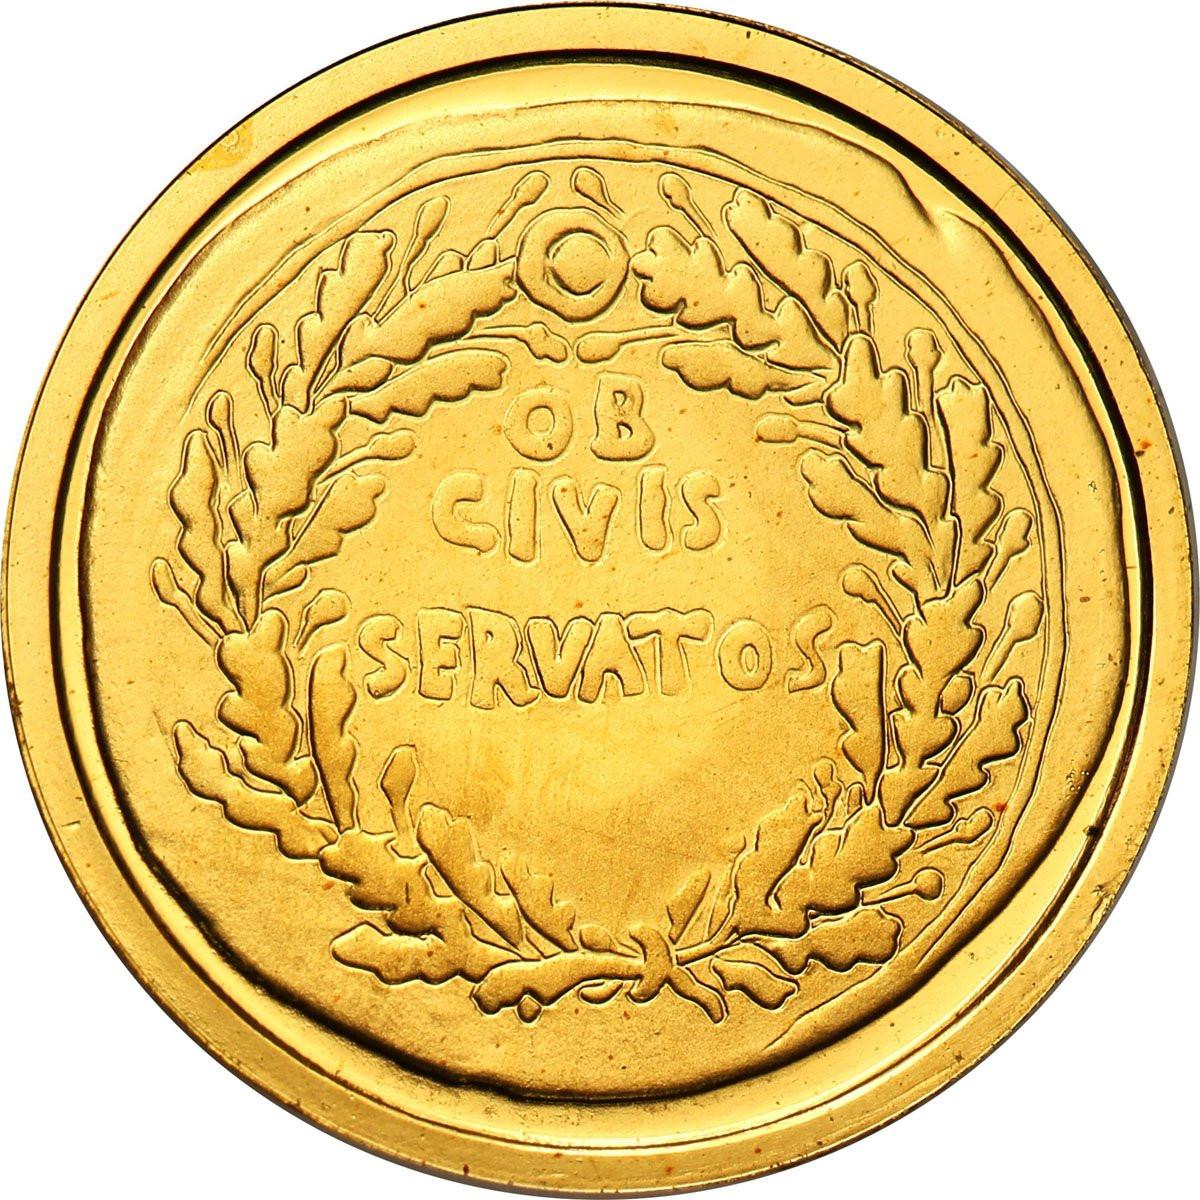 Hiszpania 20 euro 2008